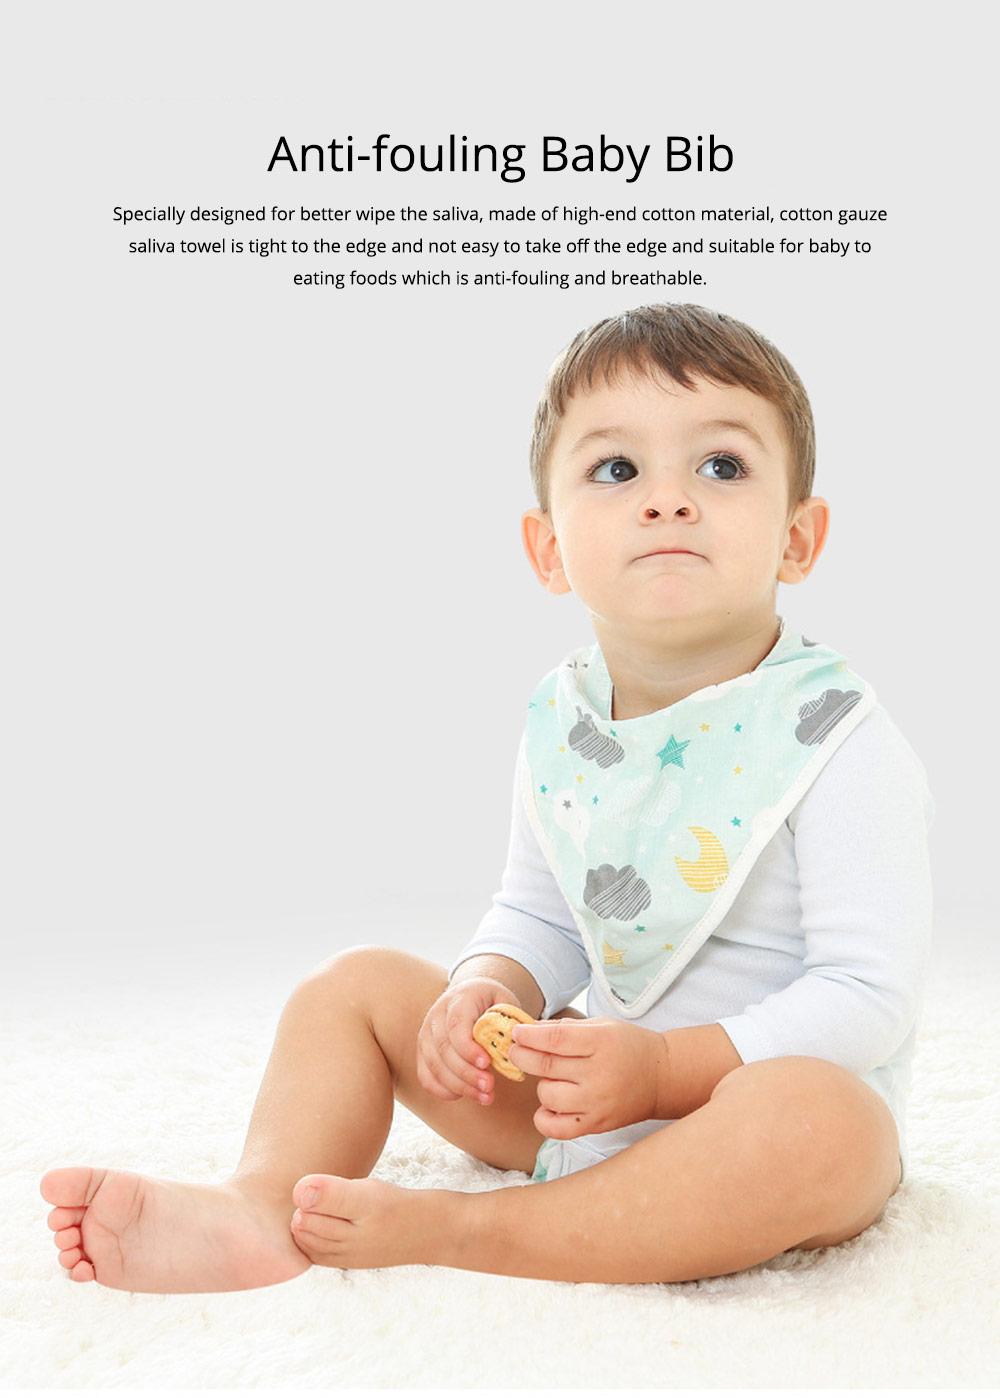 Baby Cotton Gauze Saliva Towel with Dark Buckle Design & Ultra-soft Bag Edge Design, Baby Bib with Cute Cartoon Design 0